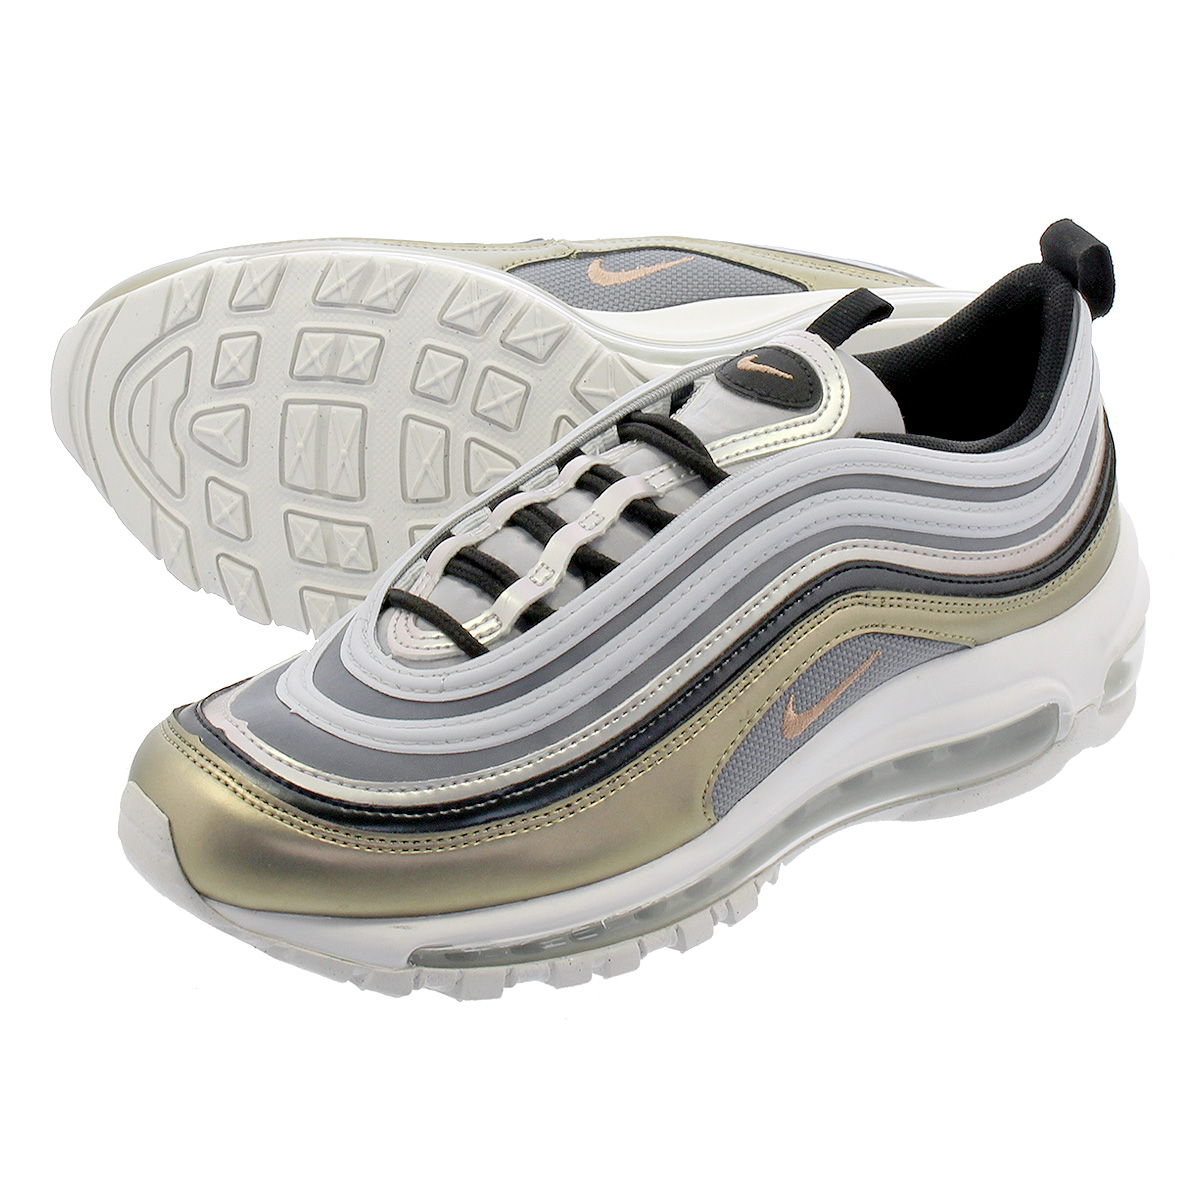 Nike Air Max 97 (Metallic PlatinumMetallic Red Bronze) GS Kids Shoes AV3181 001   eBay